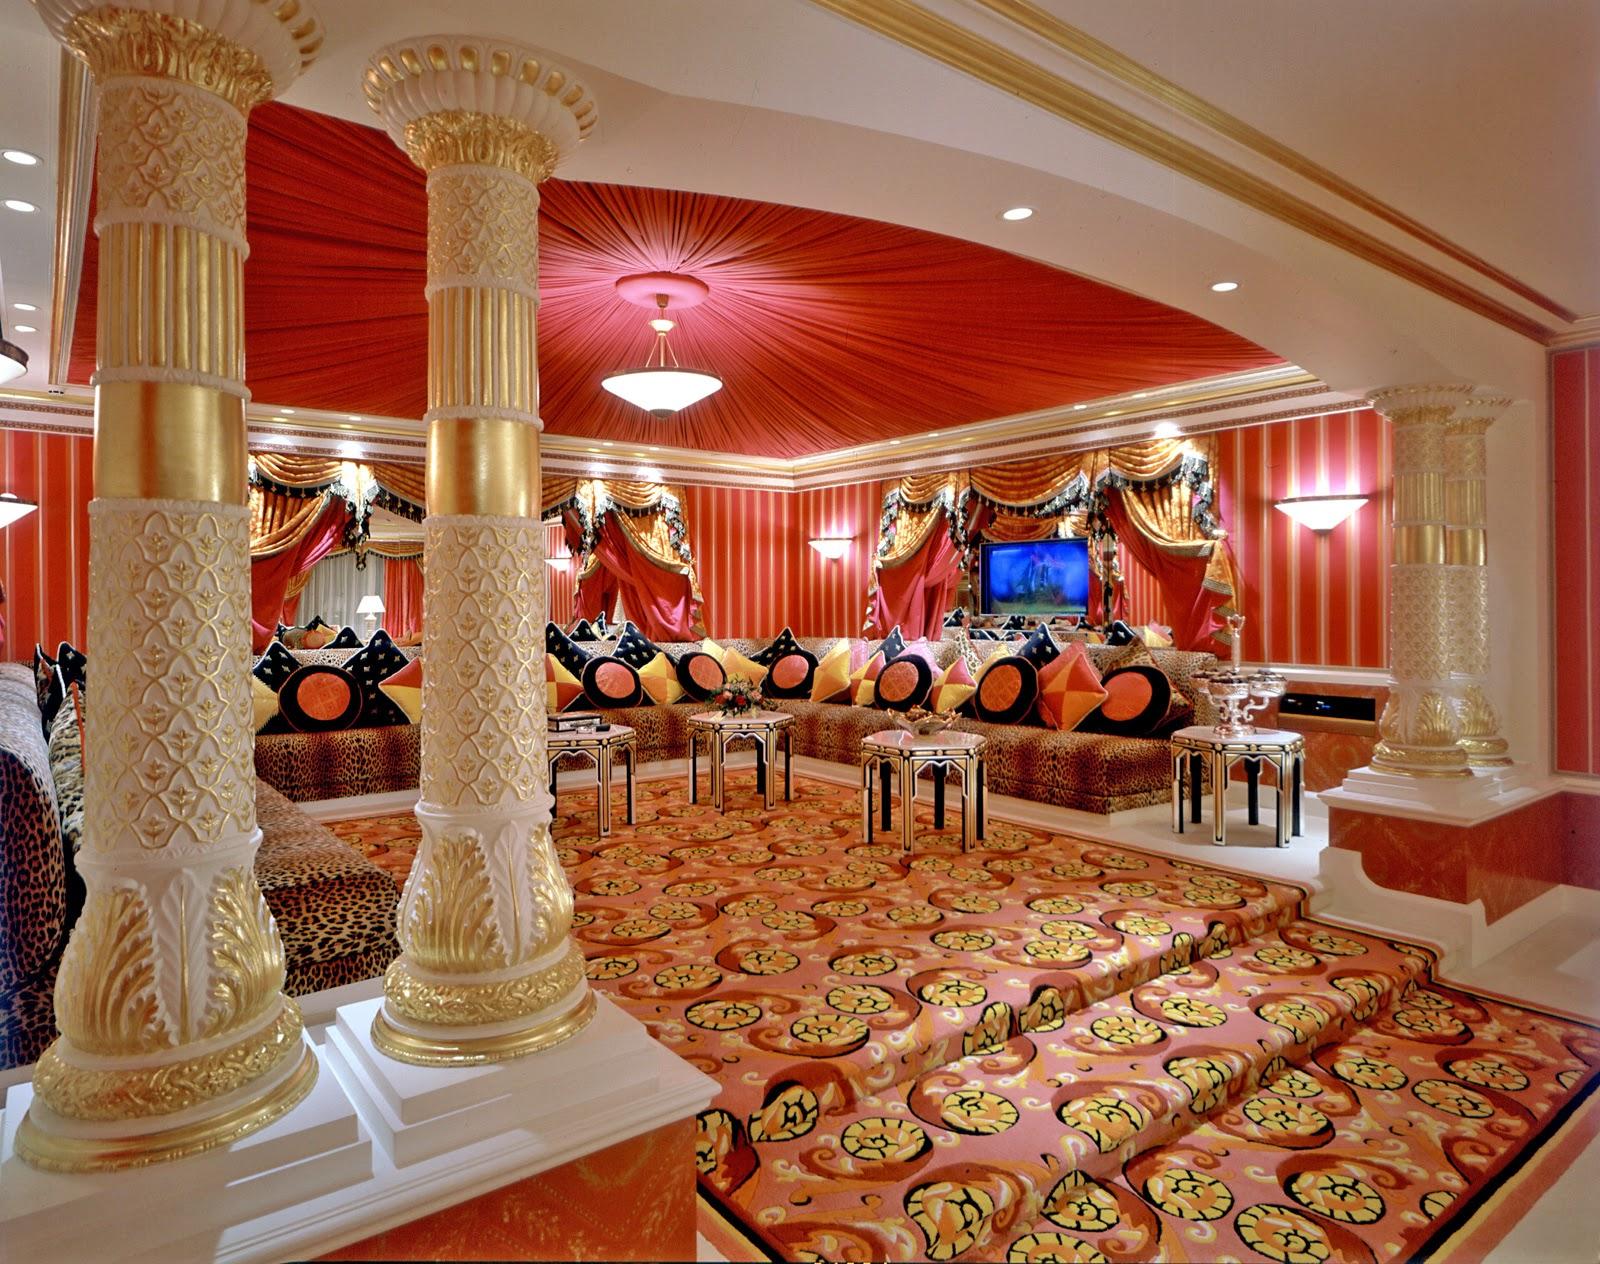 Luxury Bedroom Interior Design IdeasGlamorous Decorating Ideas